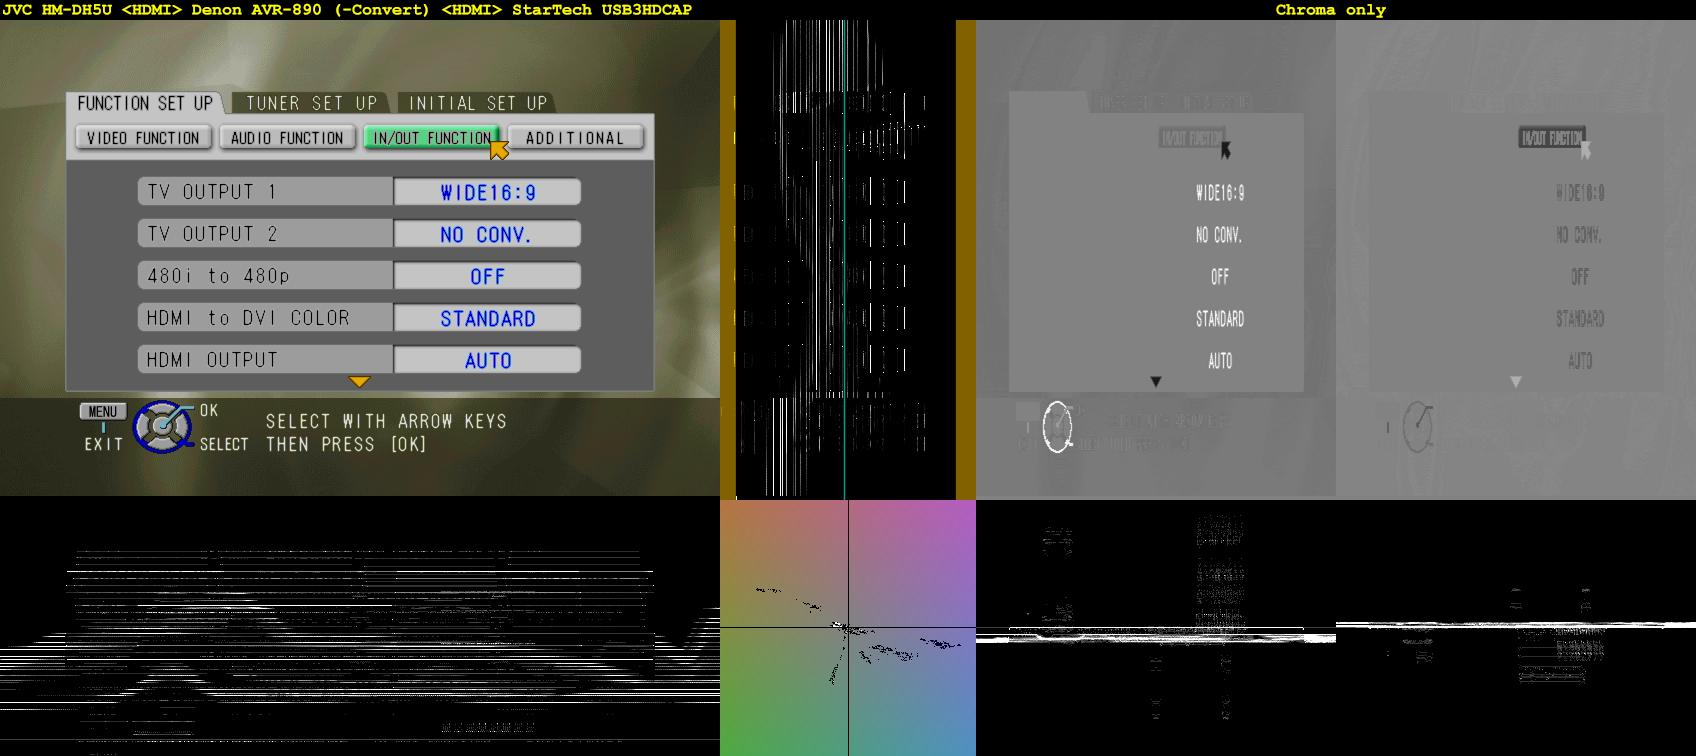 Click image for larger version  Name:Menu - JVC HM-DH5U =HDMI= Denon AVR-890, -Convert =HDMI= StarTech USB3HDCAP.png Views:3198 Size:396.3 KB ID:35268